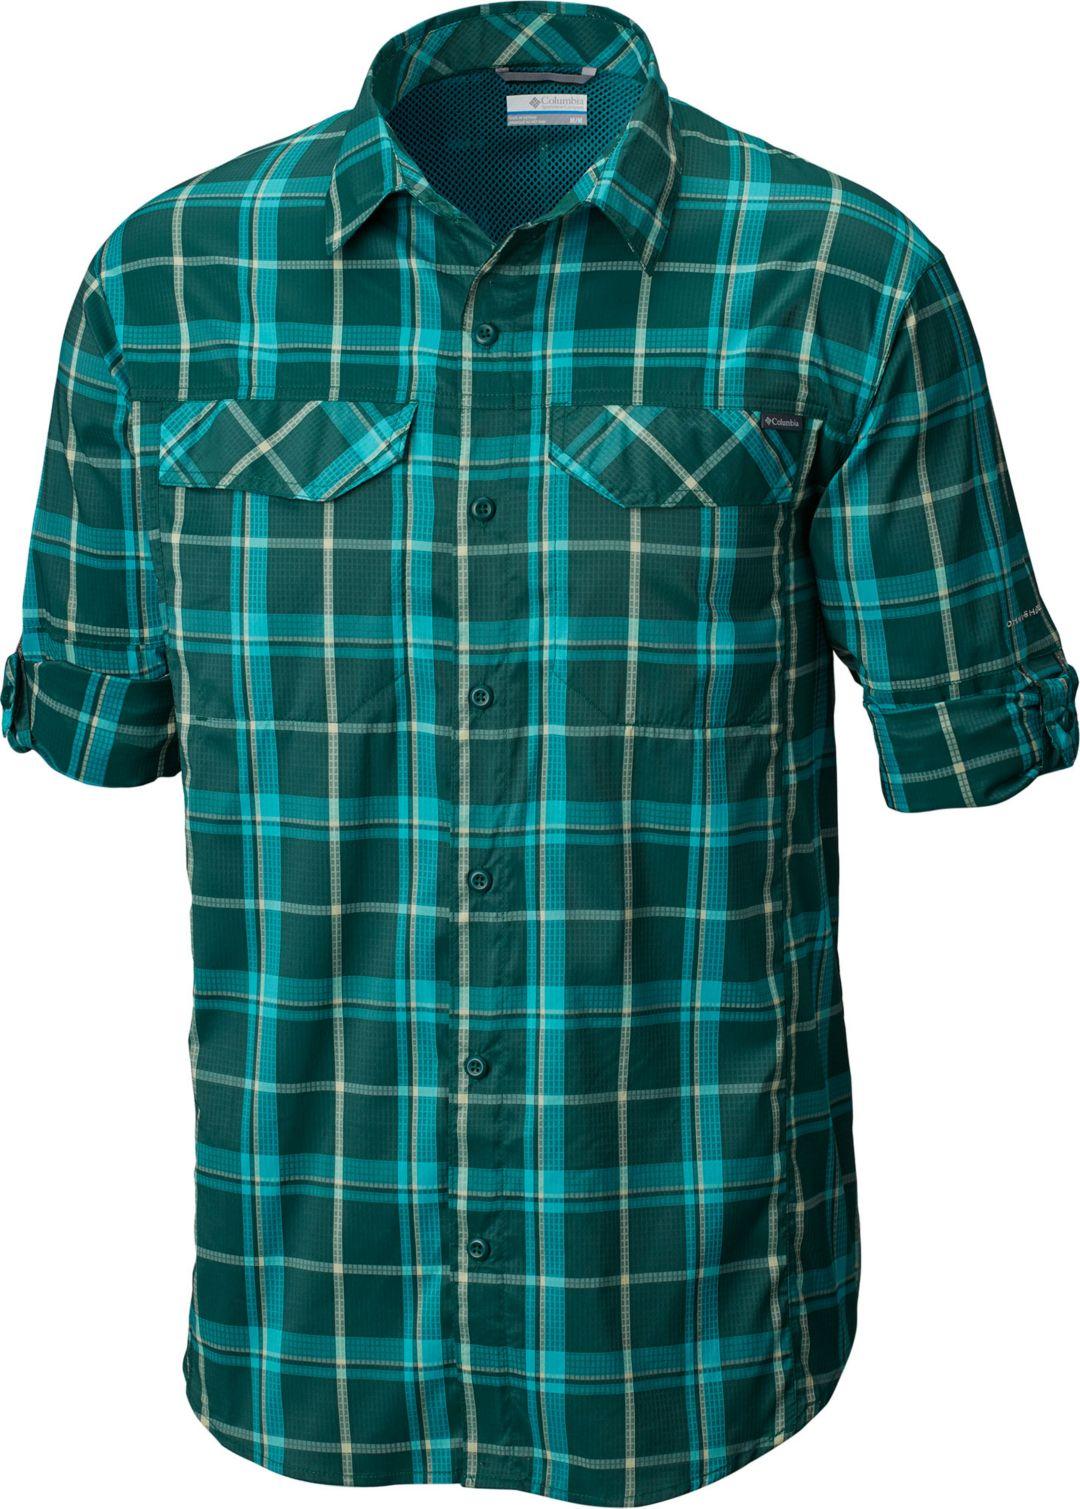 15adc1e0fe4 Columbia Men's Silver Ridge Lite Plaid Long Sleeve Shirt   DICK'S ...